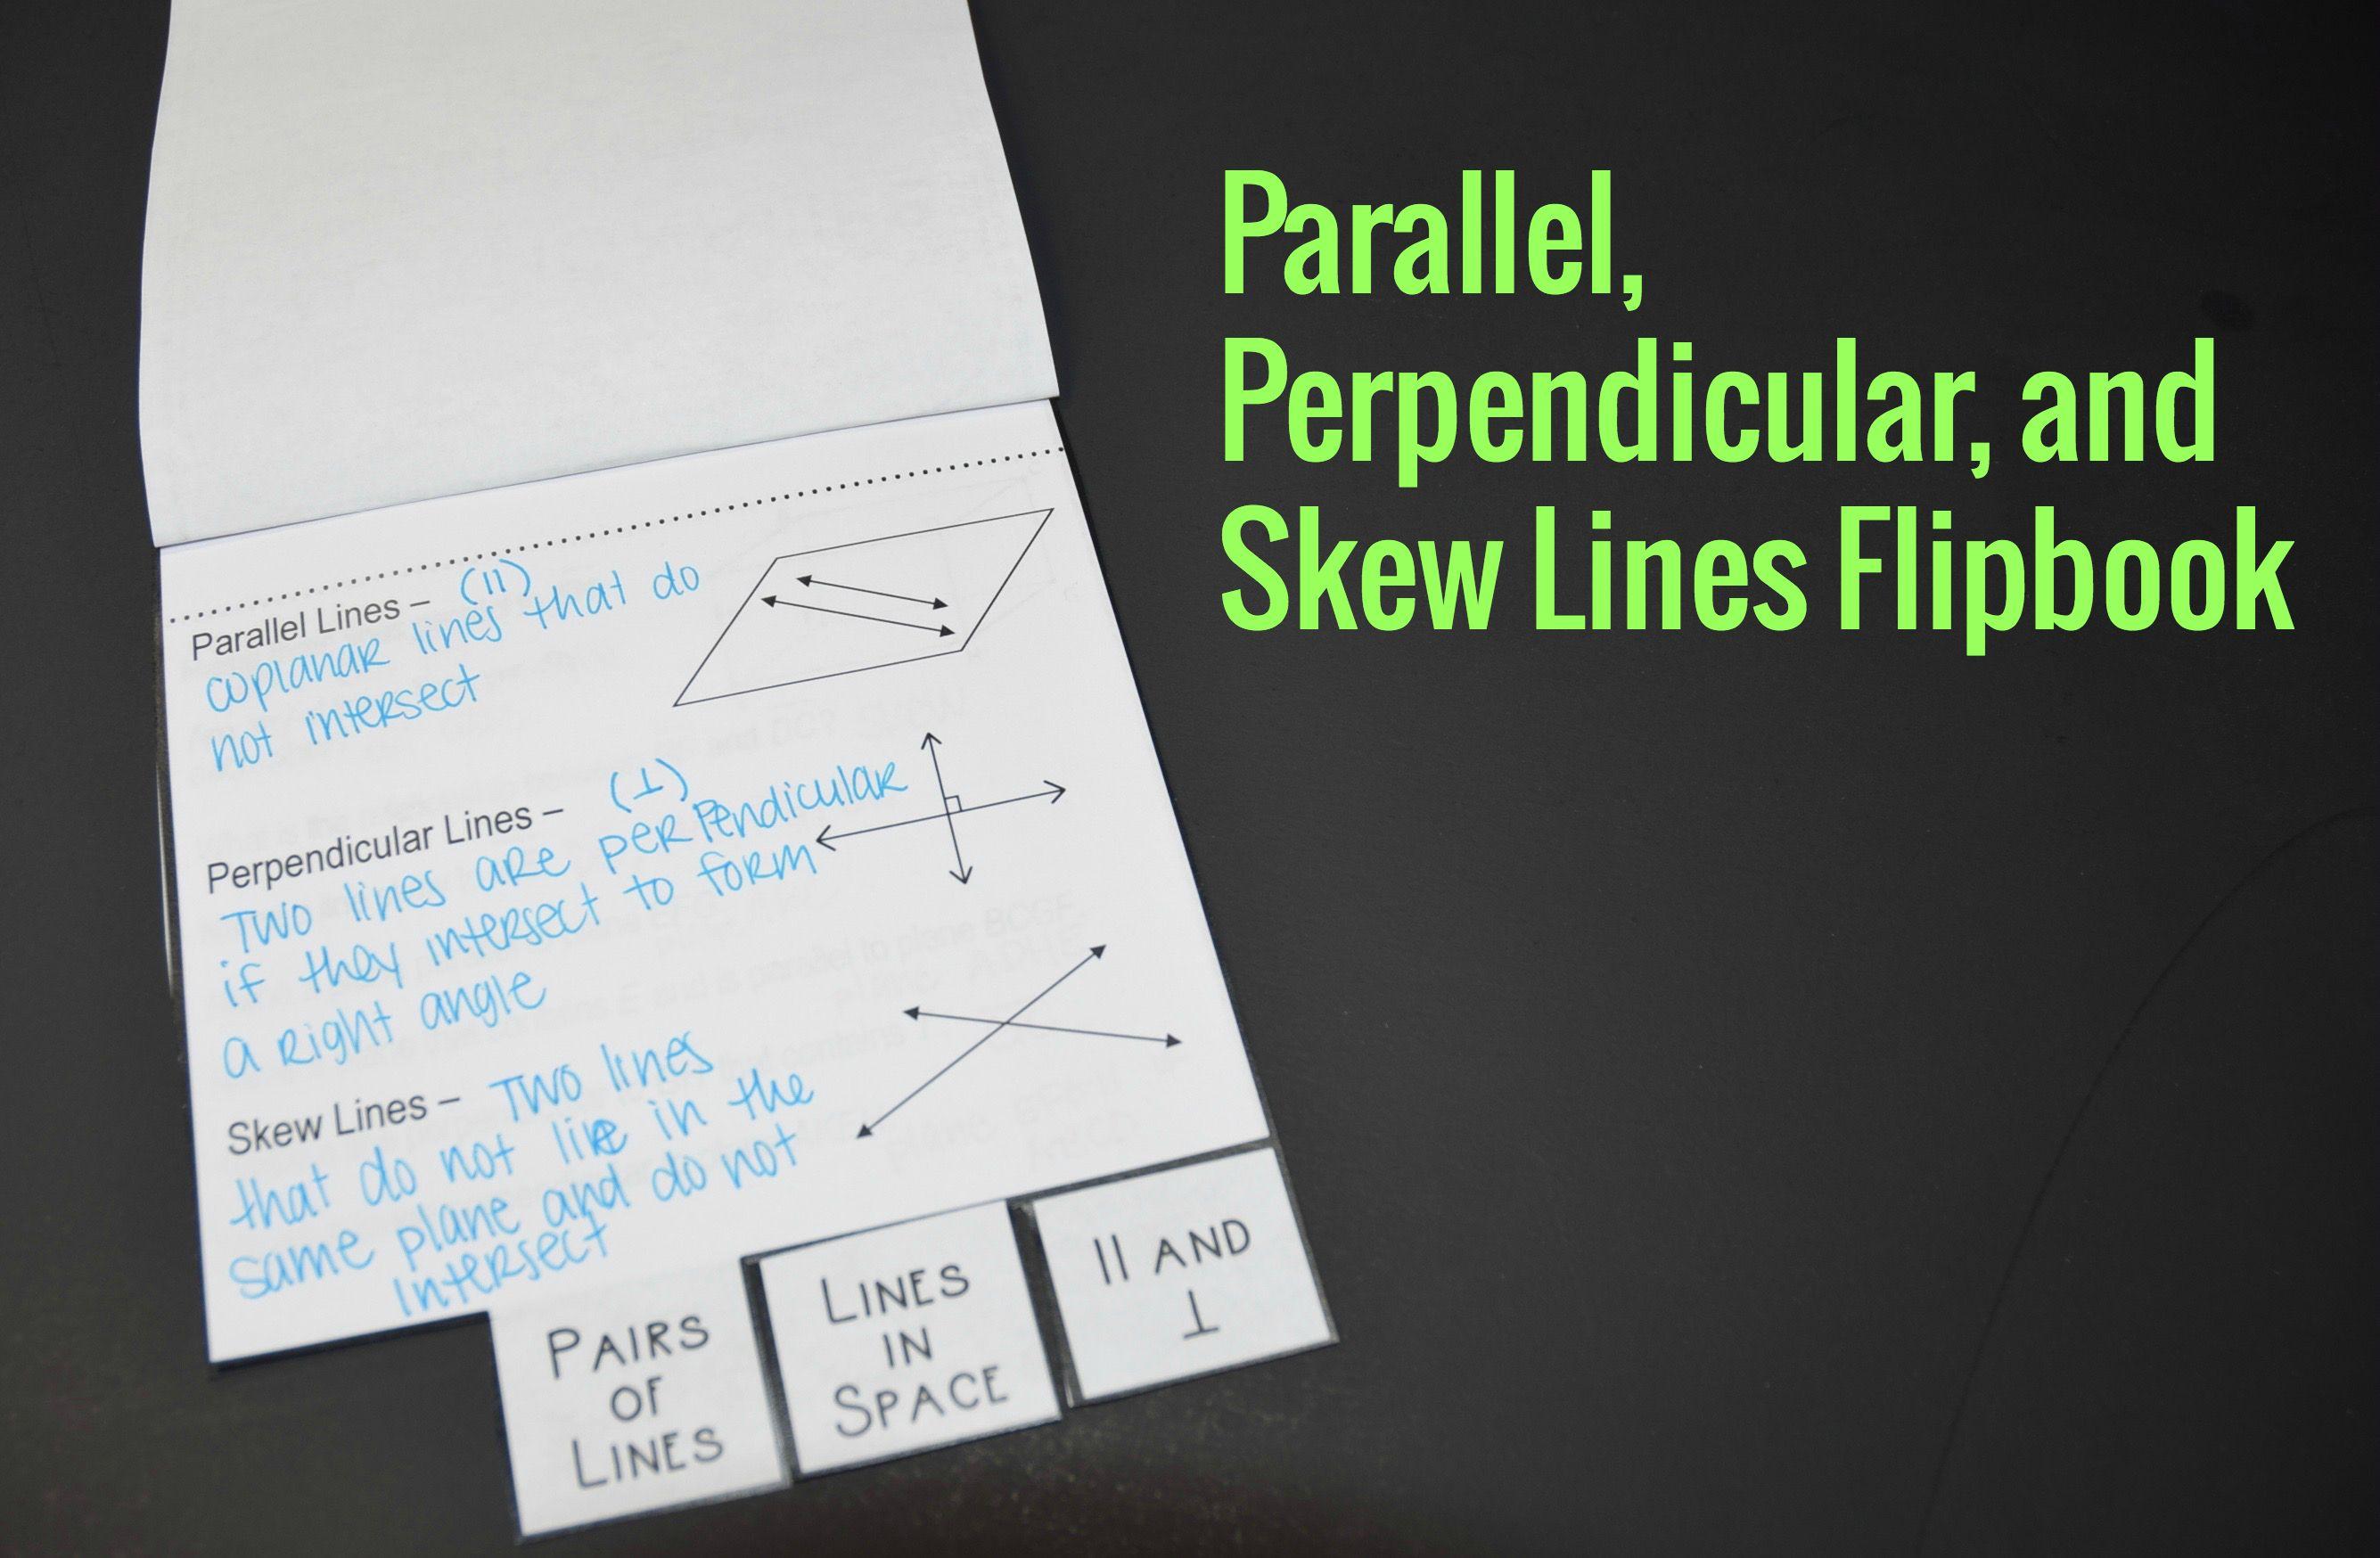 Parallel Perpendicular And Skew Lines Flipbook